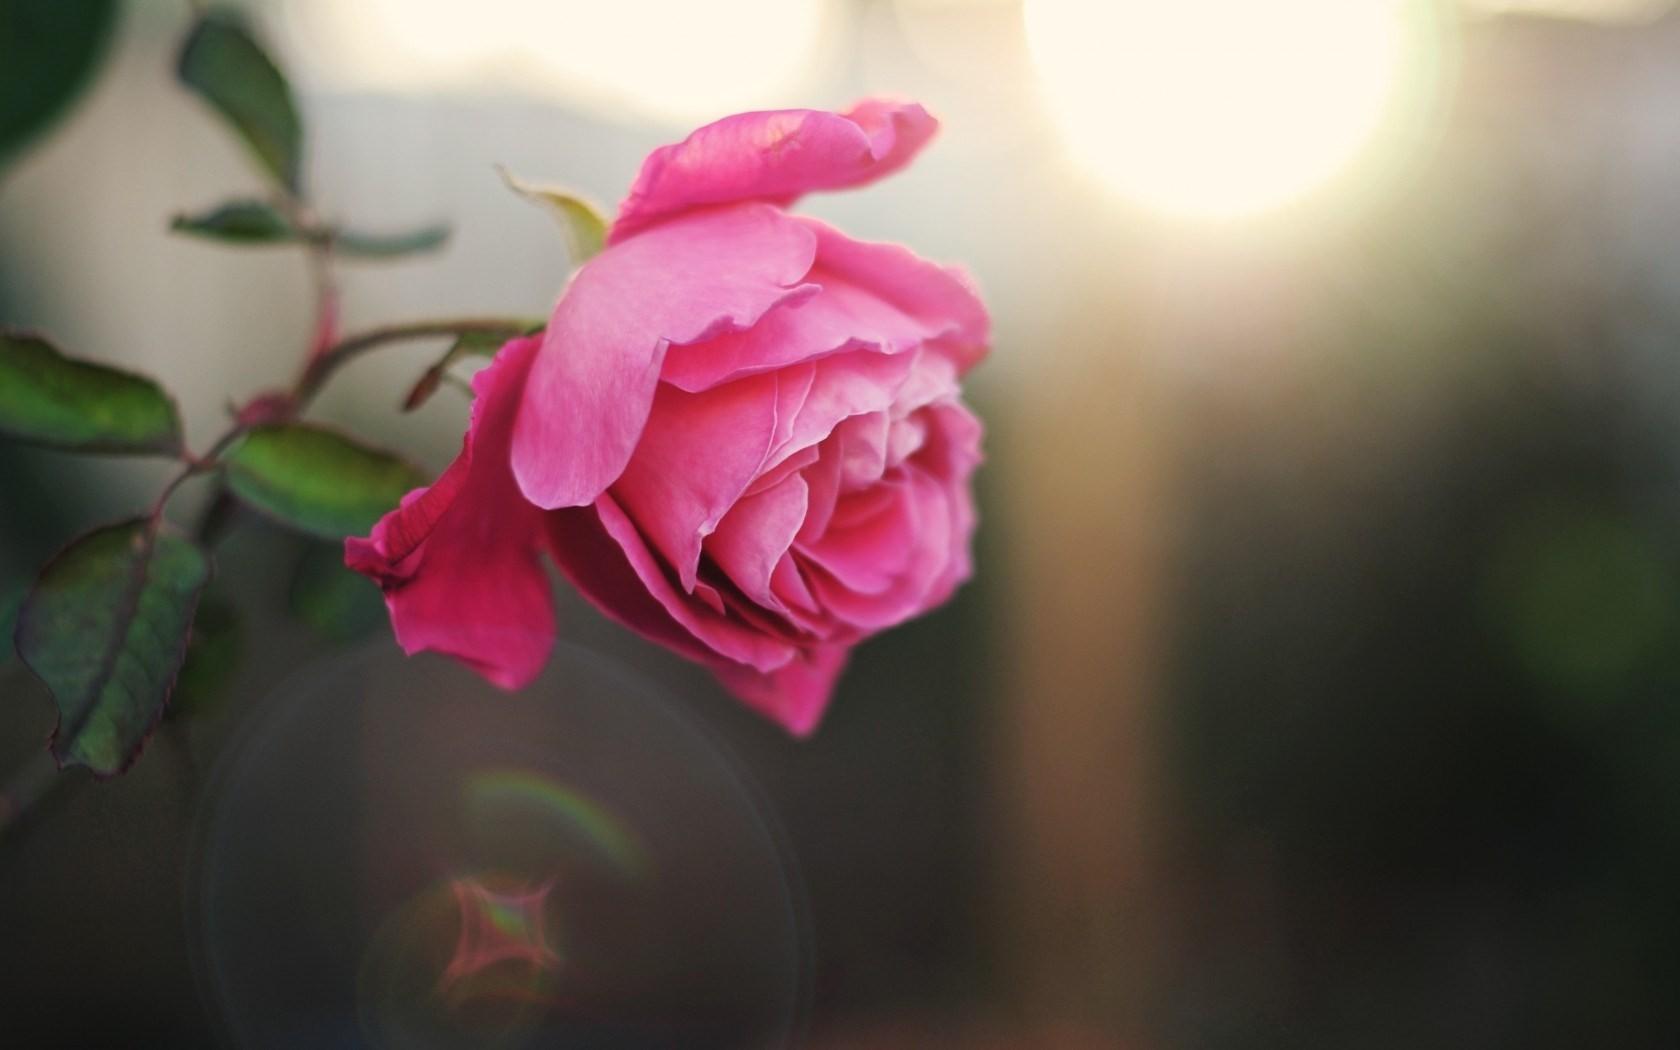 Pink Petals Flower Love Single Rose Wallpaper For Desktop - 3d Single Rose Flower , HD Wallpaper & Backgrounds